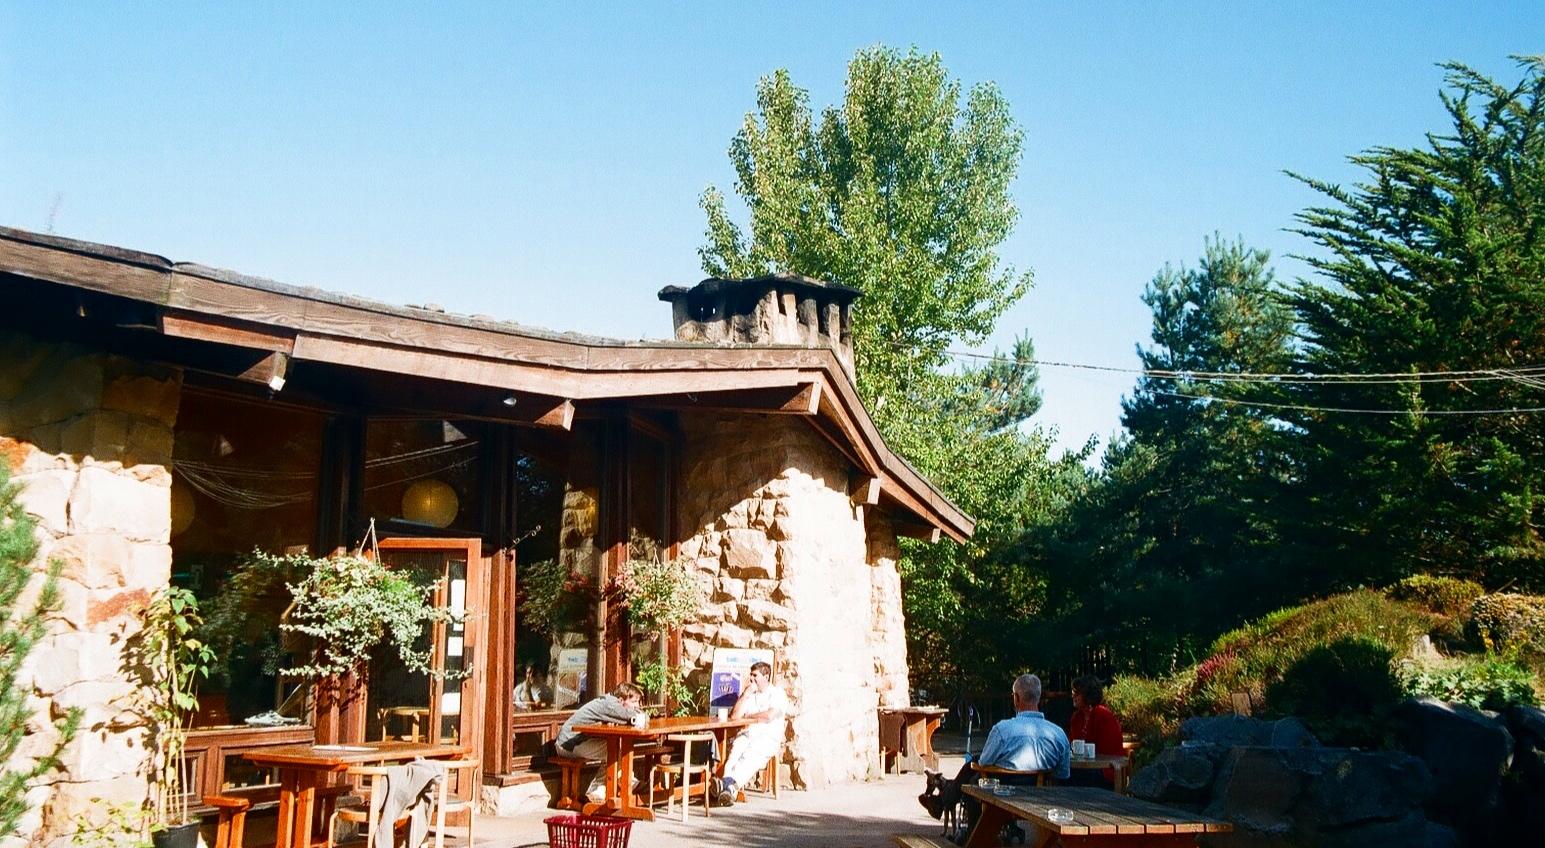 The Phoenix Cafe